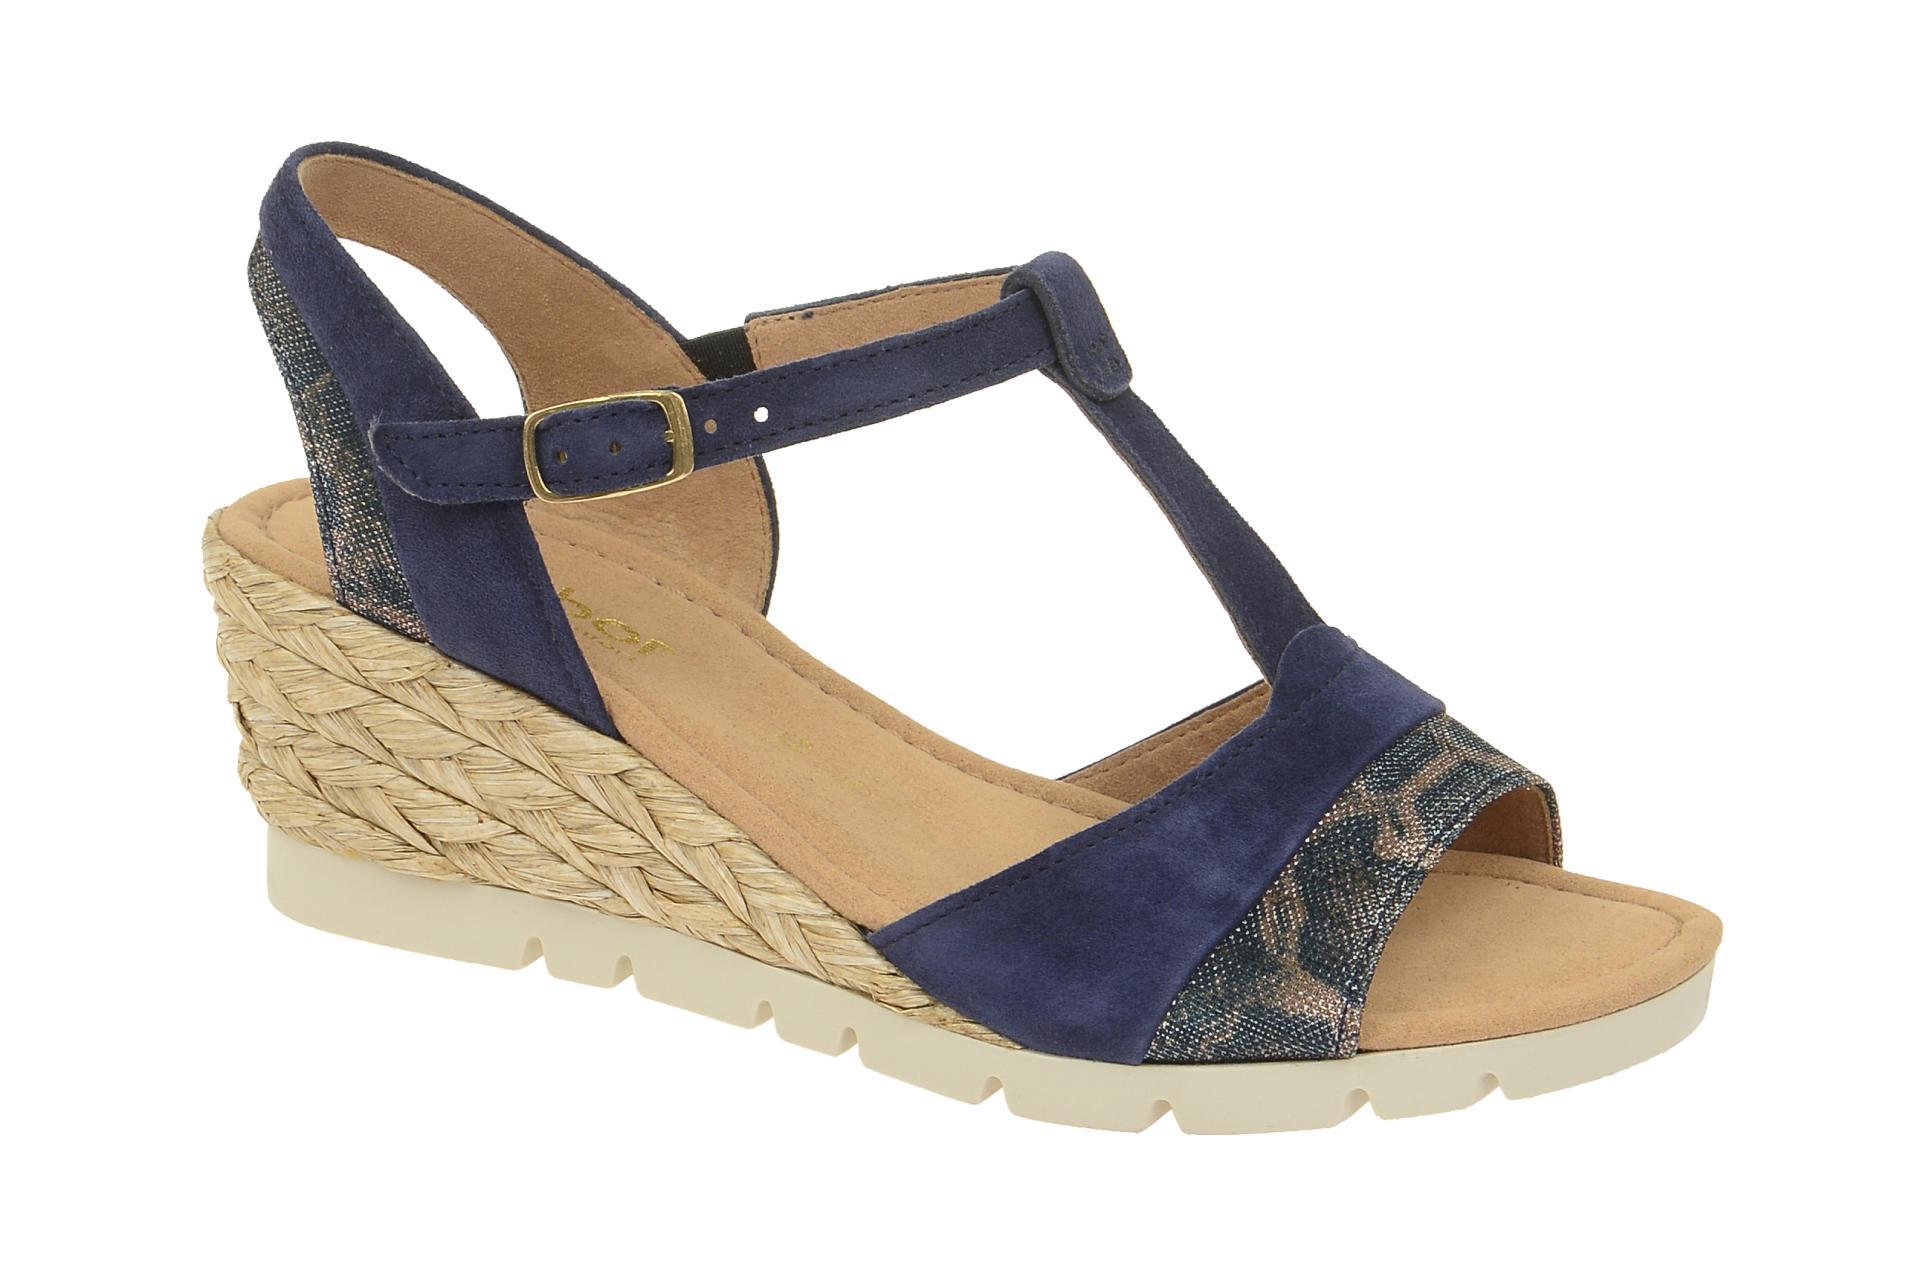 promo code afbfc f7fef Details zu Gabor Schuhe TUNIS blau Damen Sandale Sandaletten 62.841.36 NEU